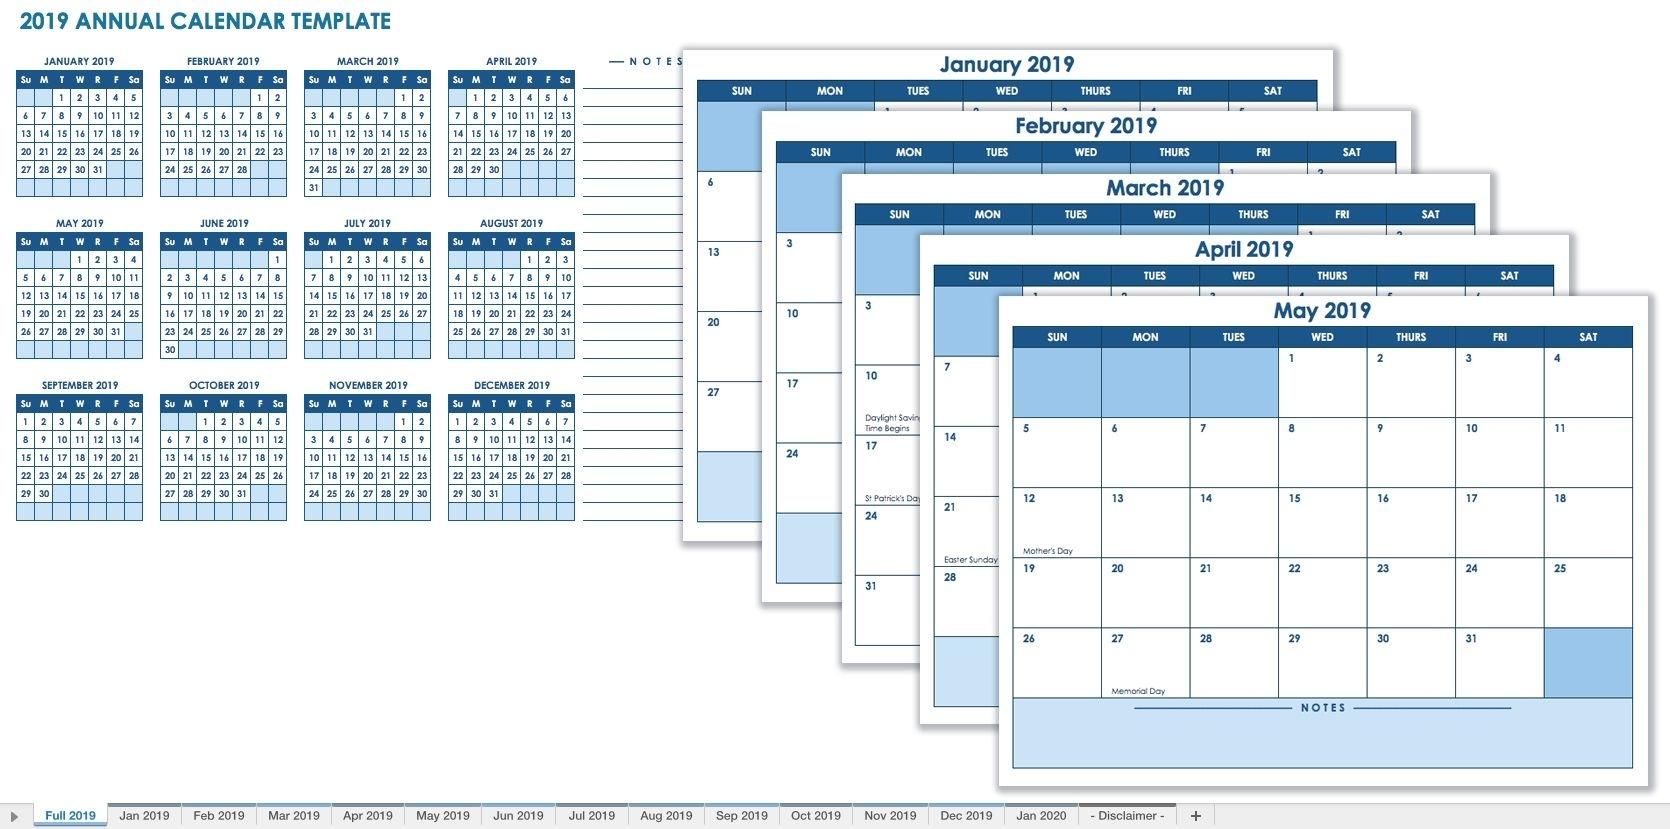 12 Month Calendar Template 2019 | Calendars | Free Monthly Calendar in 12 Month Blank Calendar Template